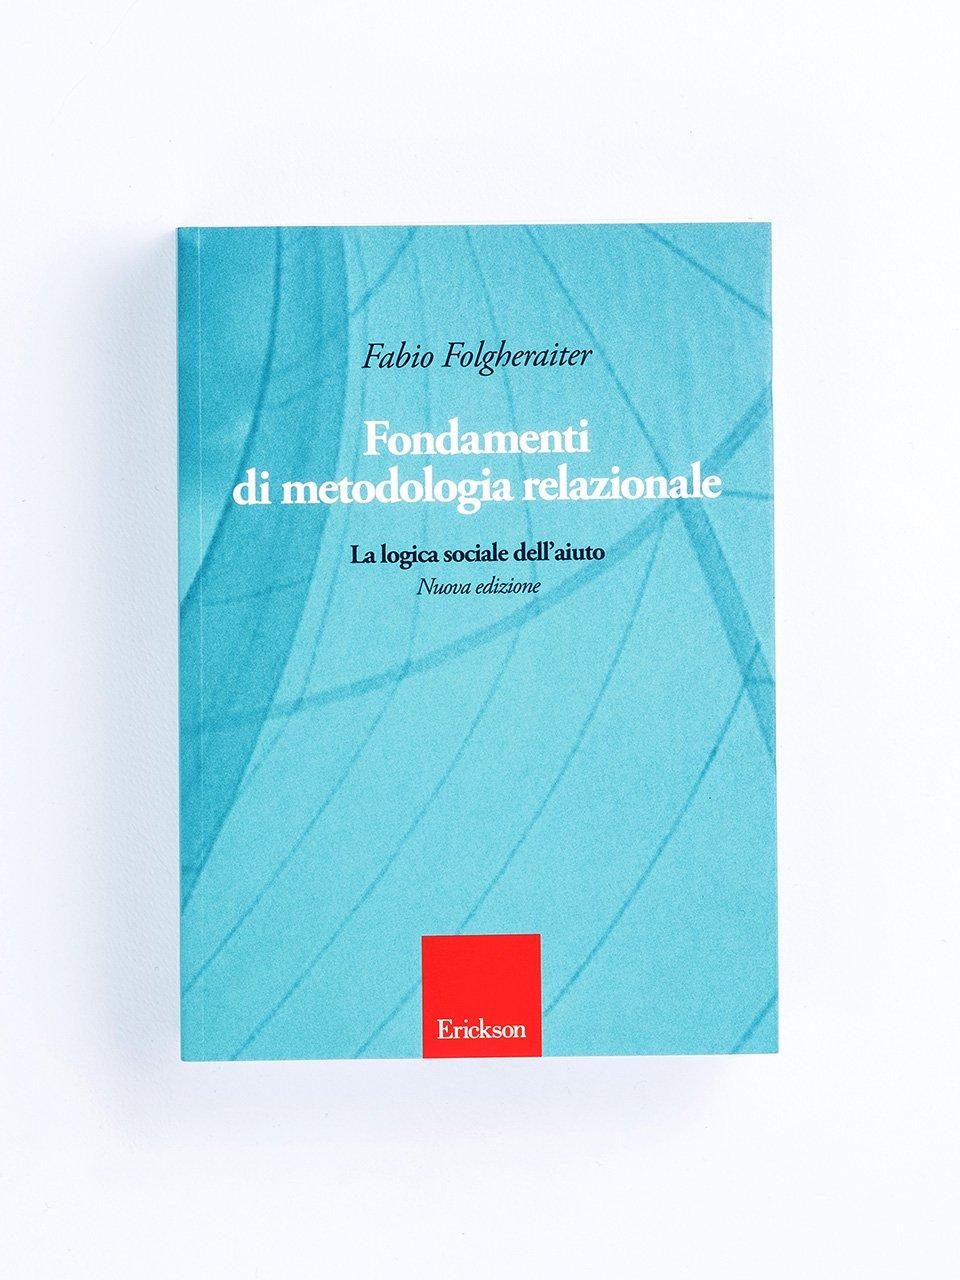 Fondamenti di metodologia relazionale - Metodo del Relational Social Work - Erickson